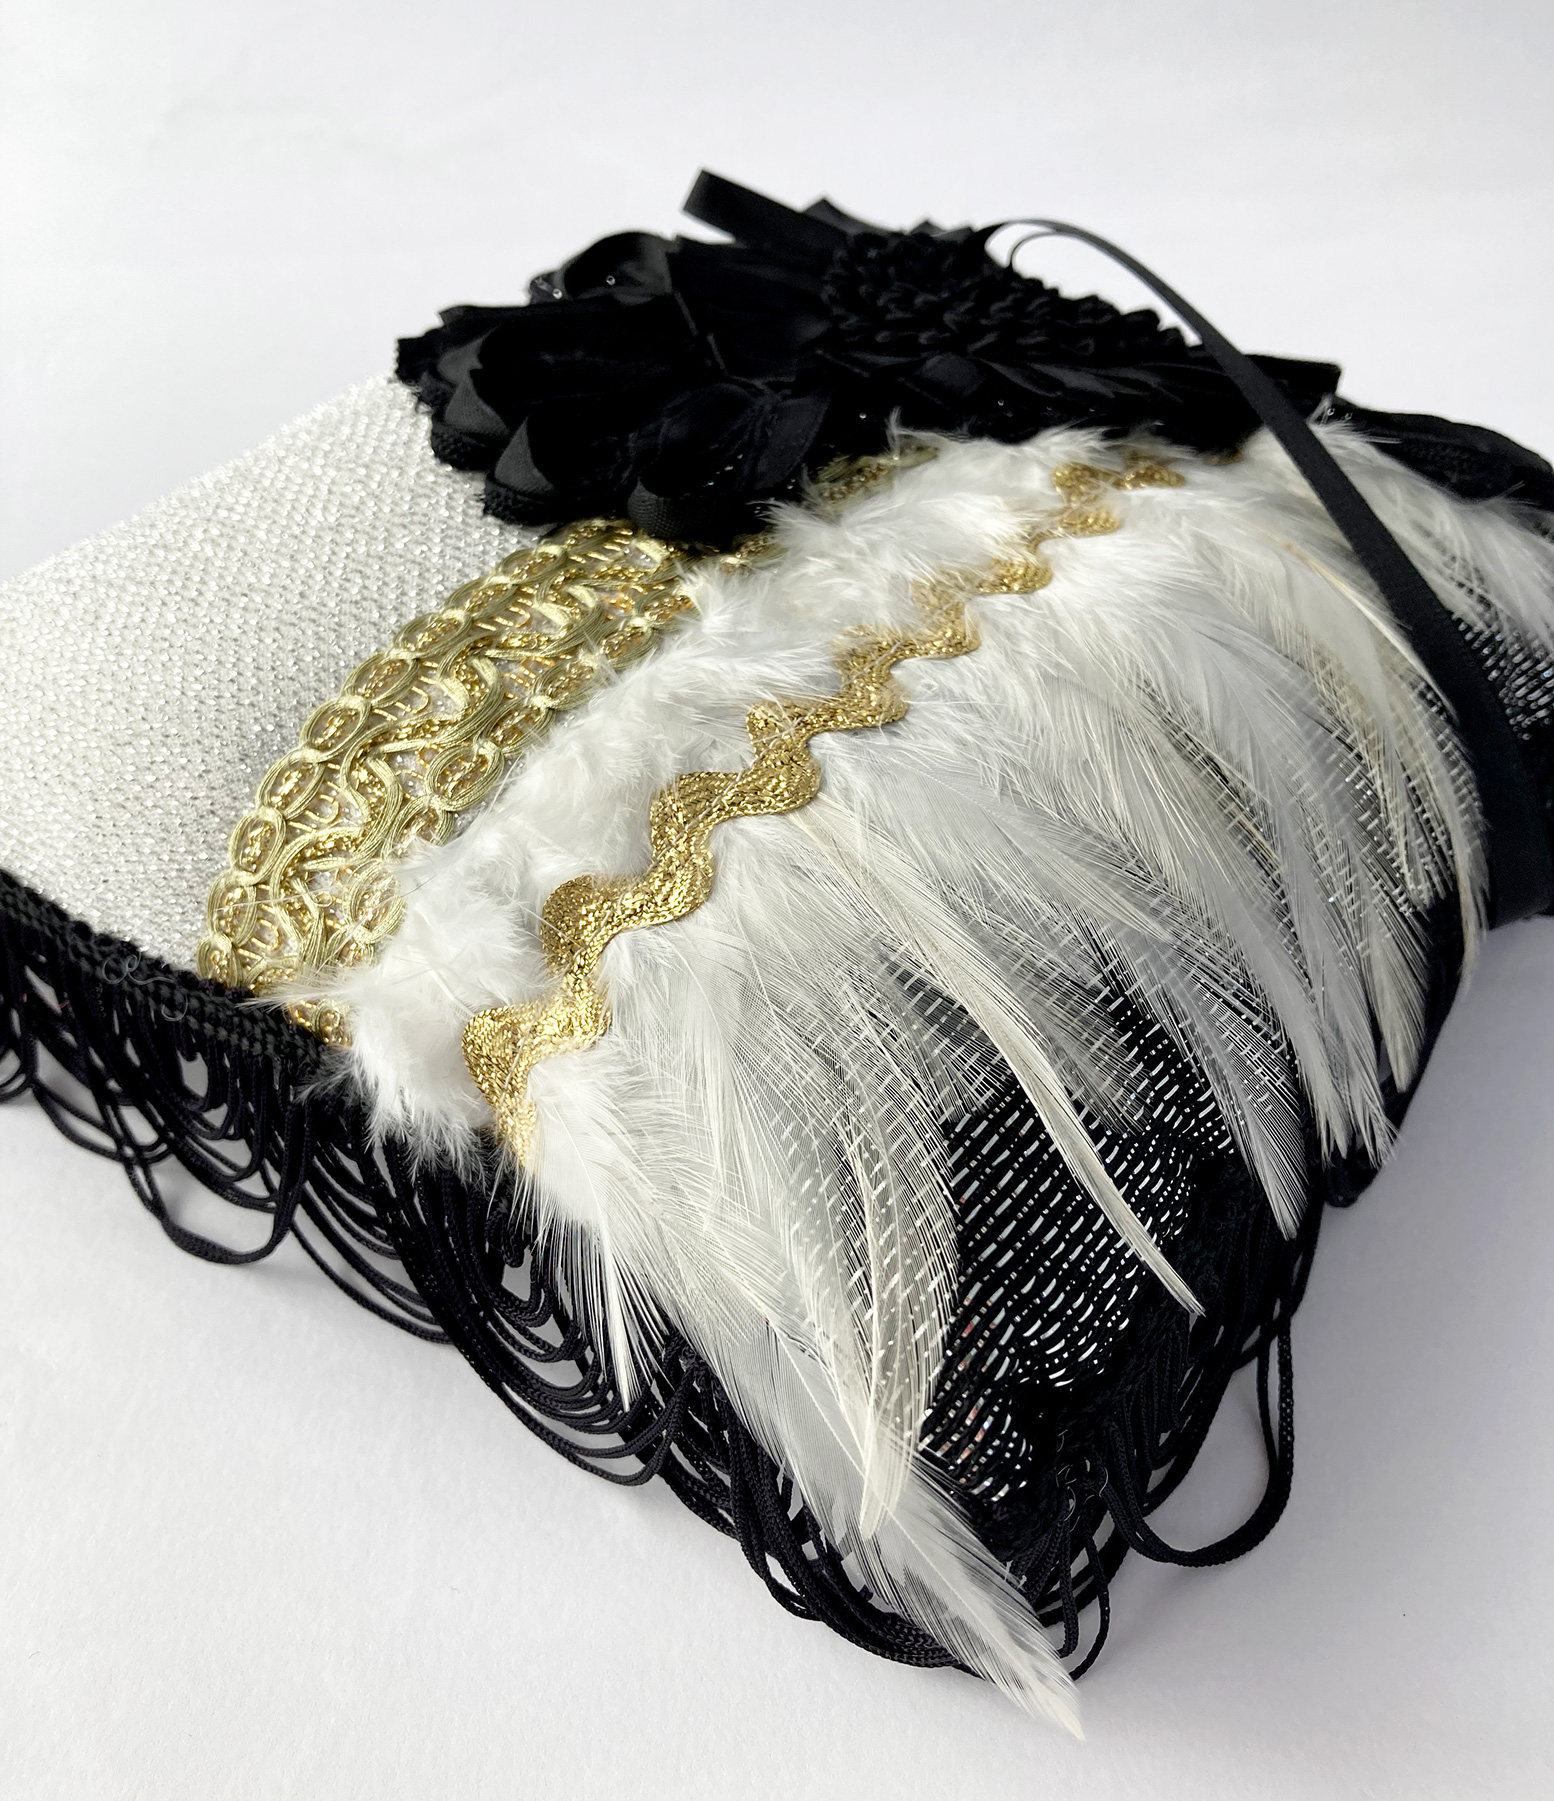 Opvallend ringkussen in zwart, wit, goud en zilver